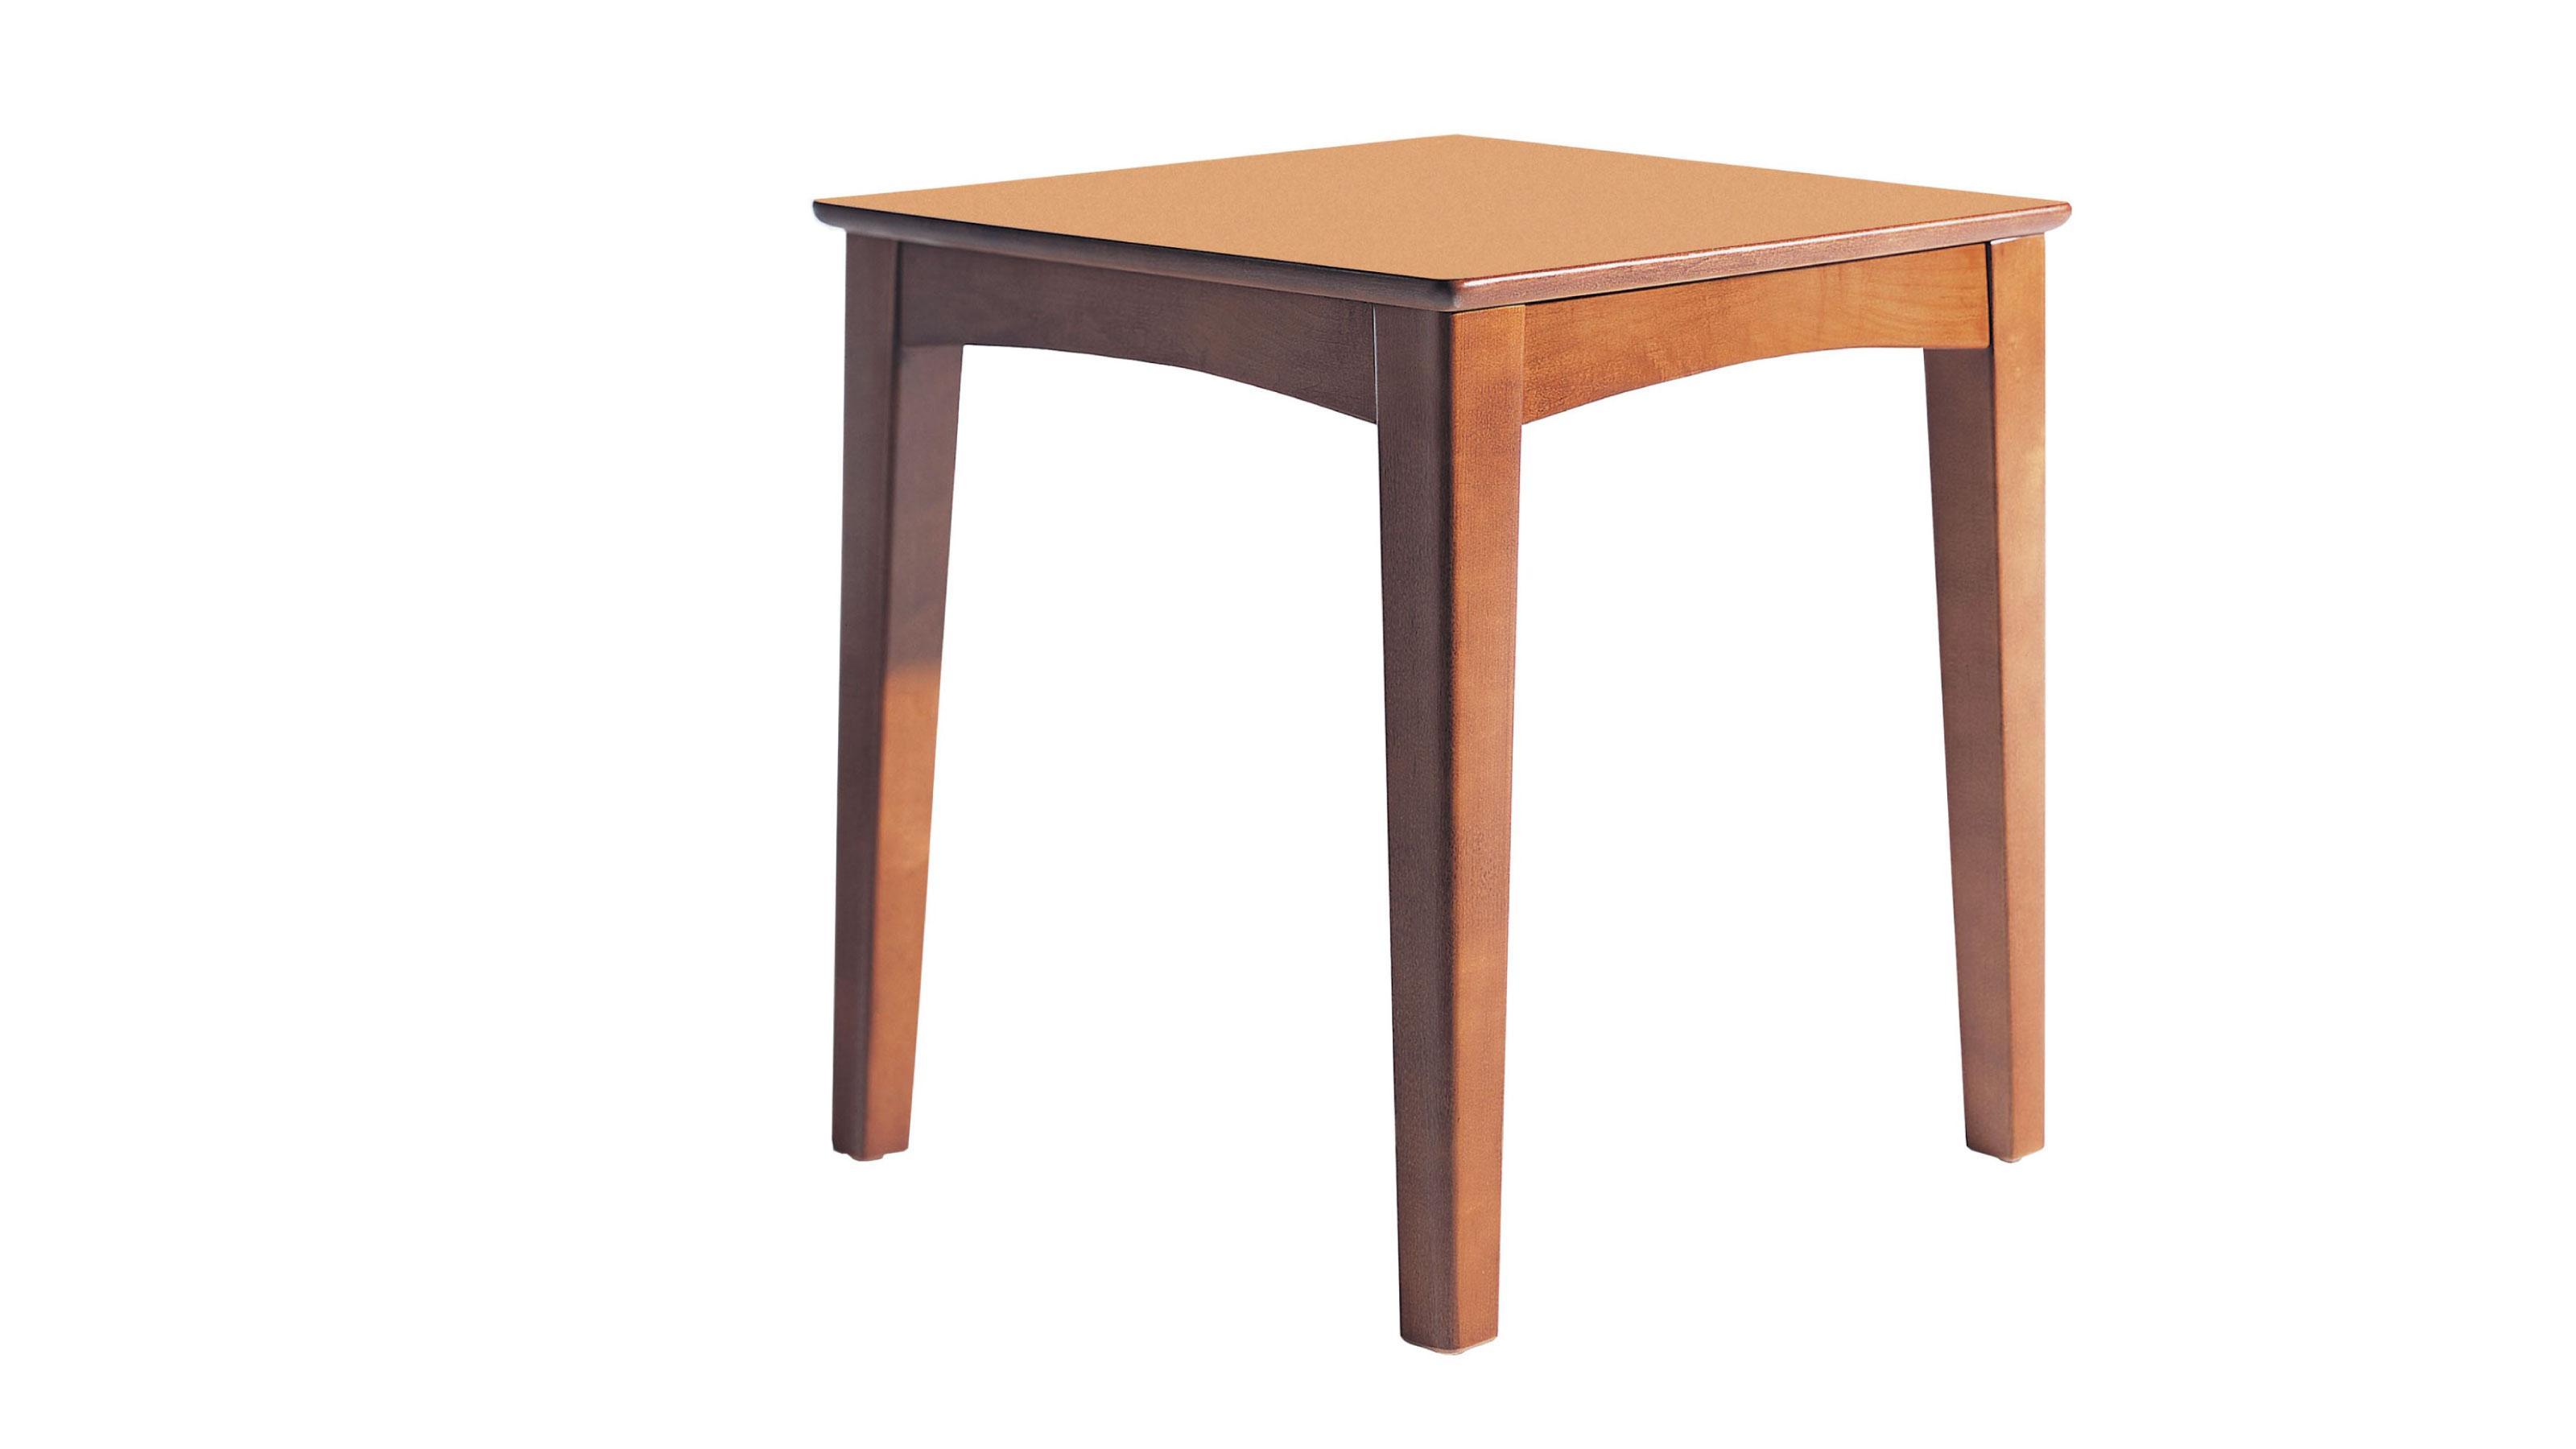 Avon Tables - Prentice Office Environments